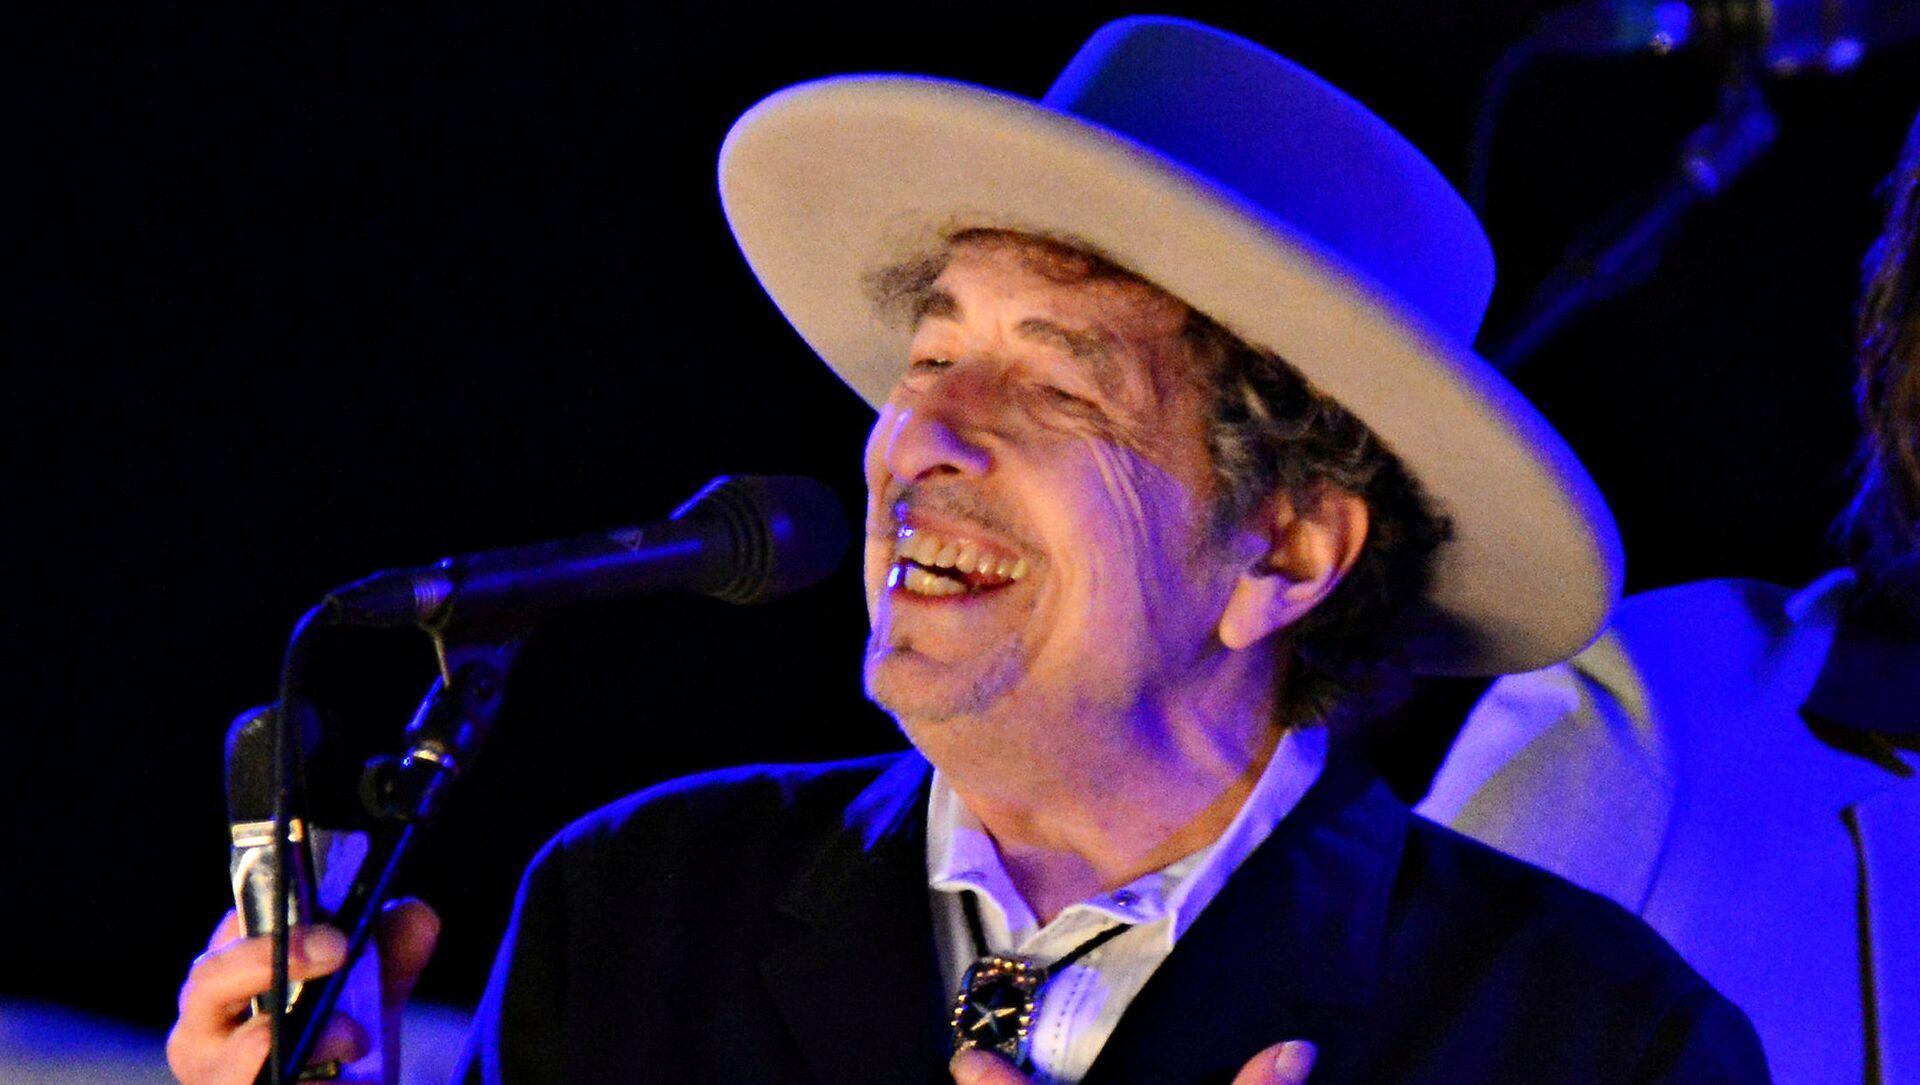 Музыкант Боб Дилан - Sputnik Грузия, 1920, 17.08.2021